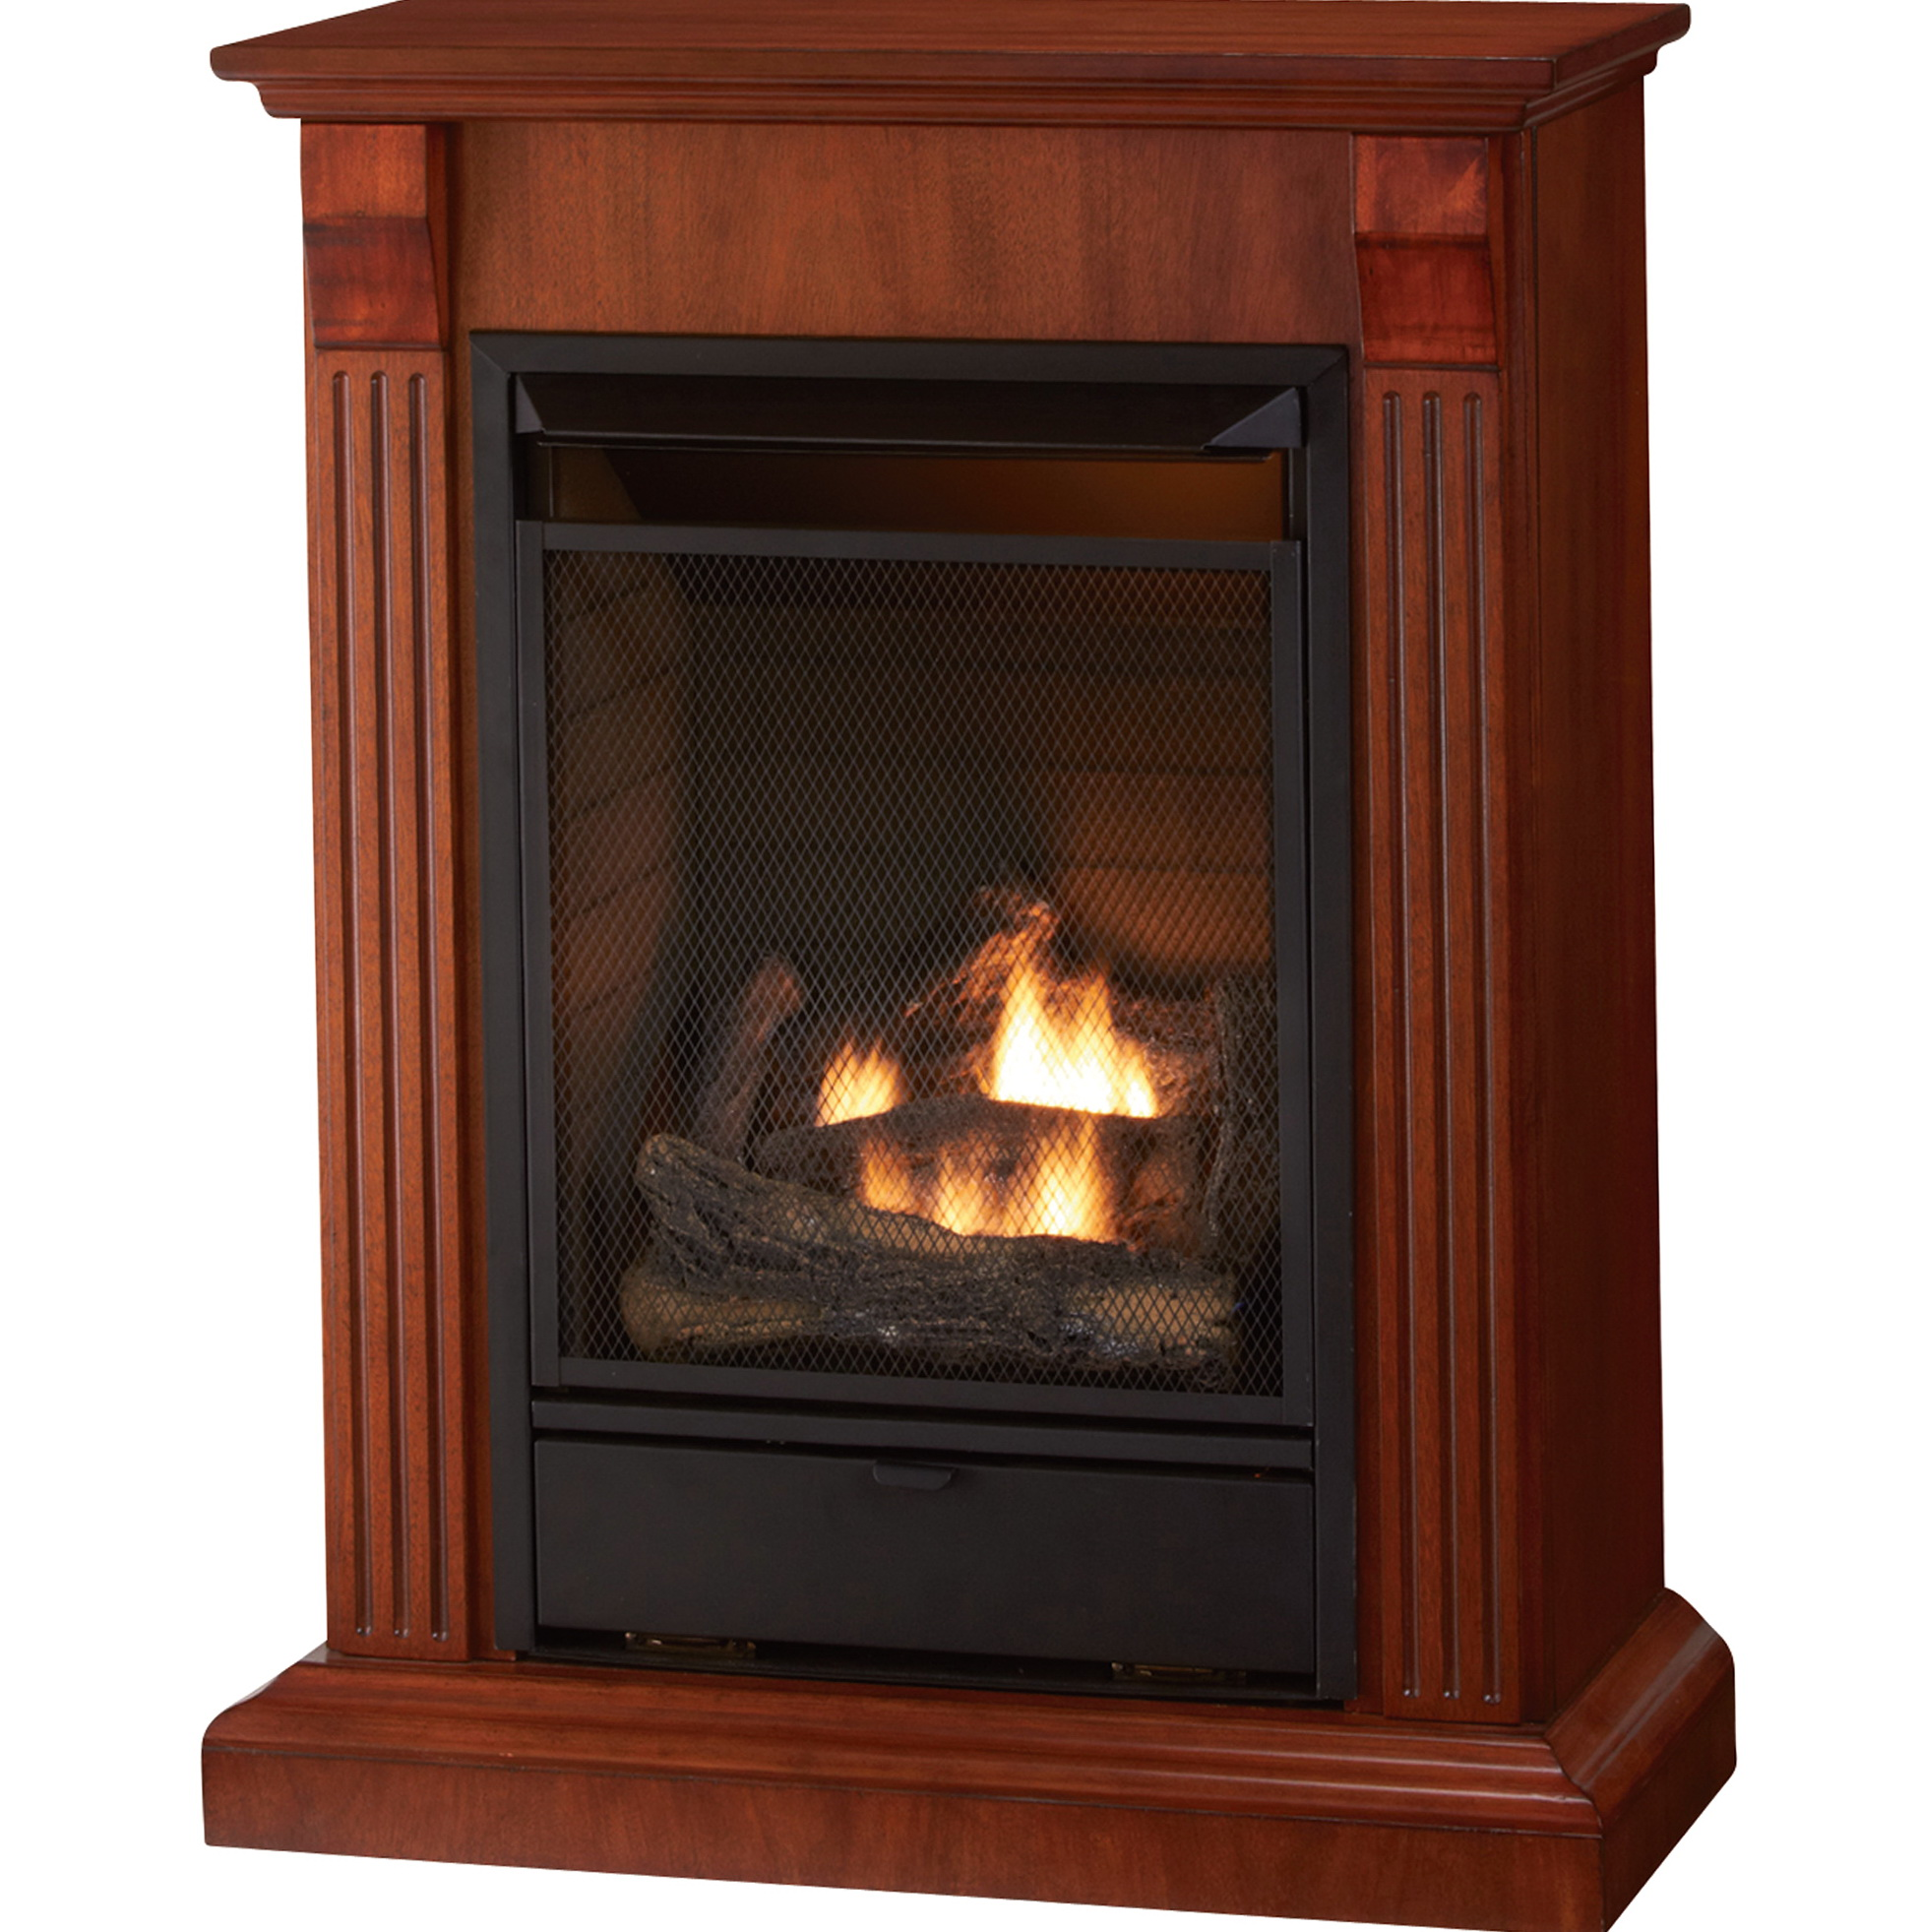 Free Standing Gas Fireplace Interior Design